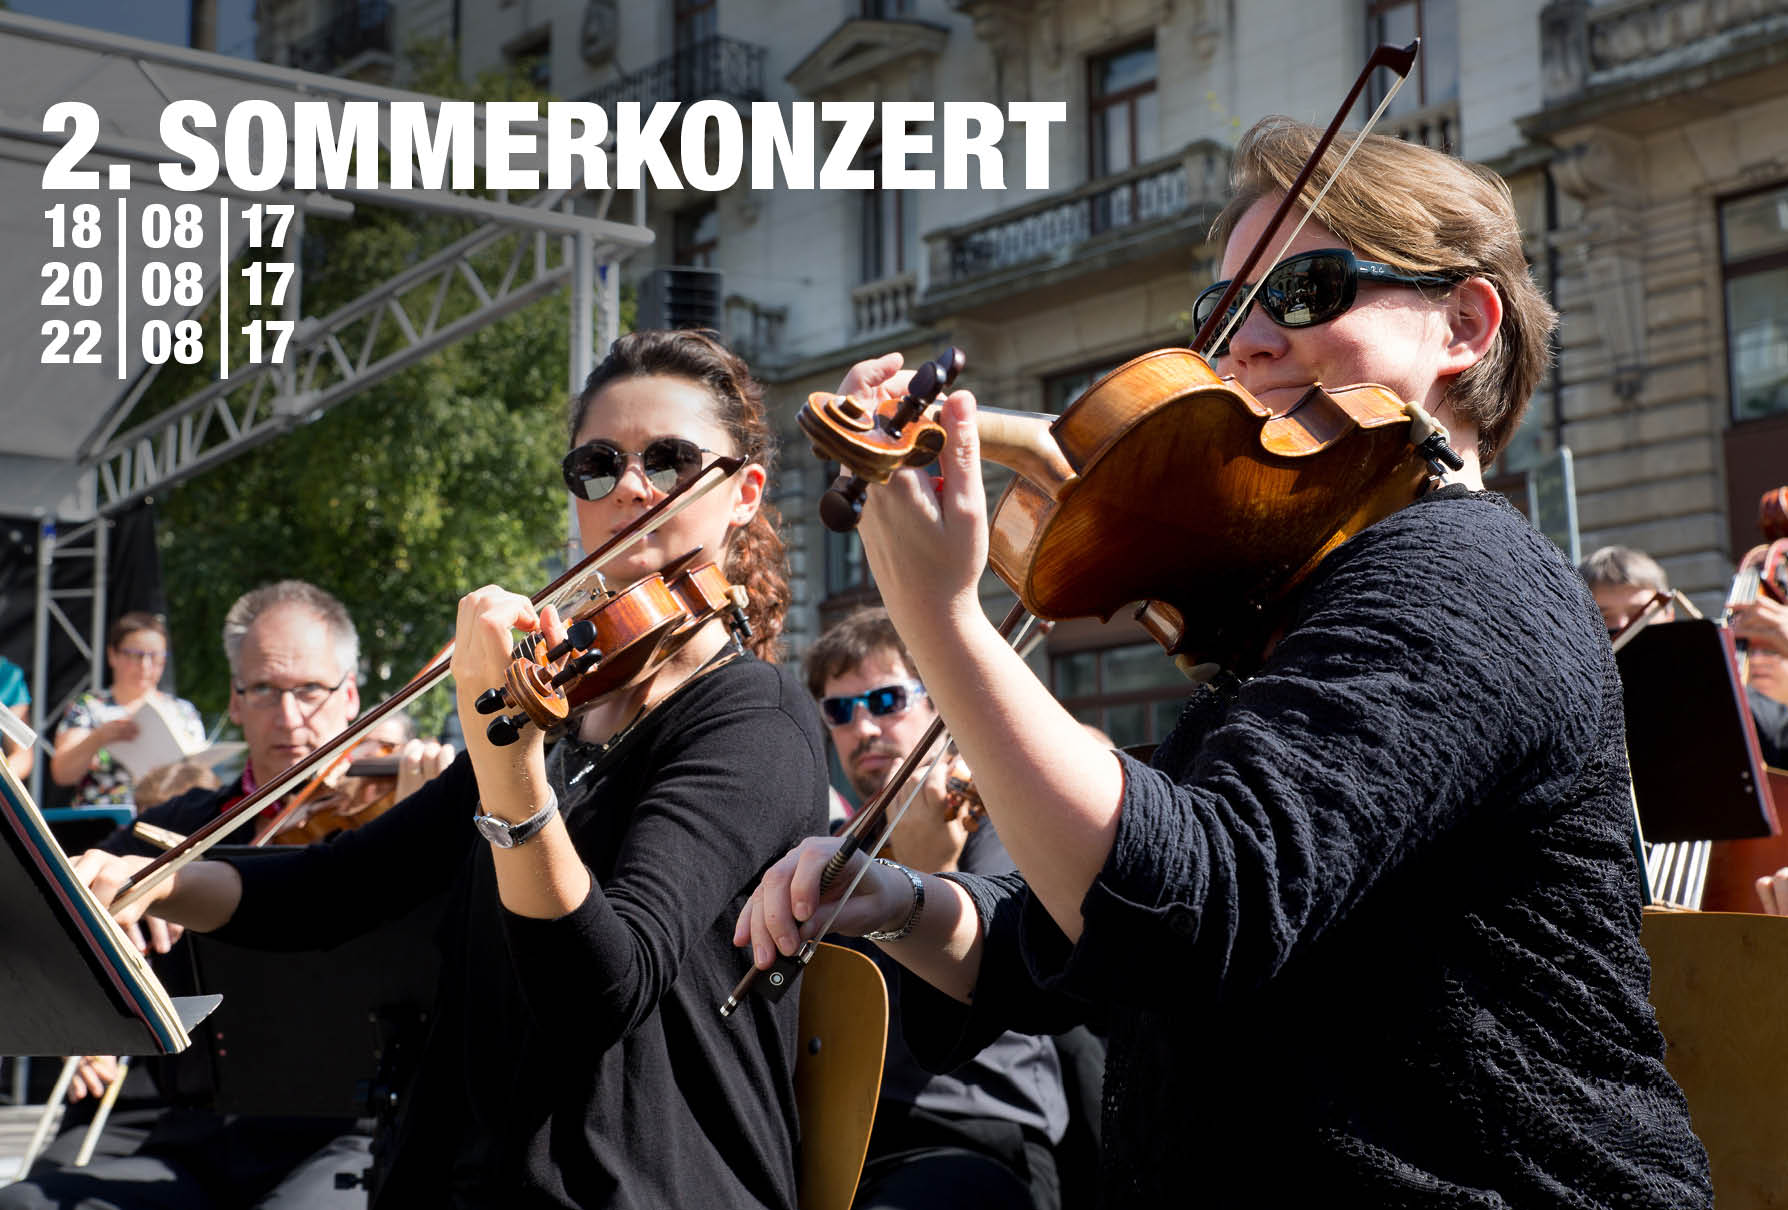 2. Sommerkonzert